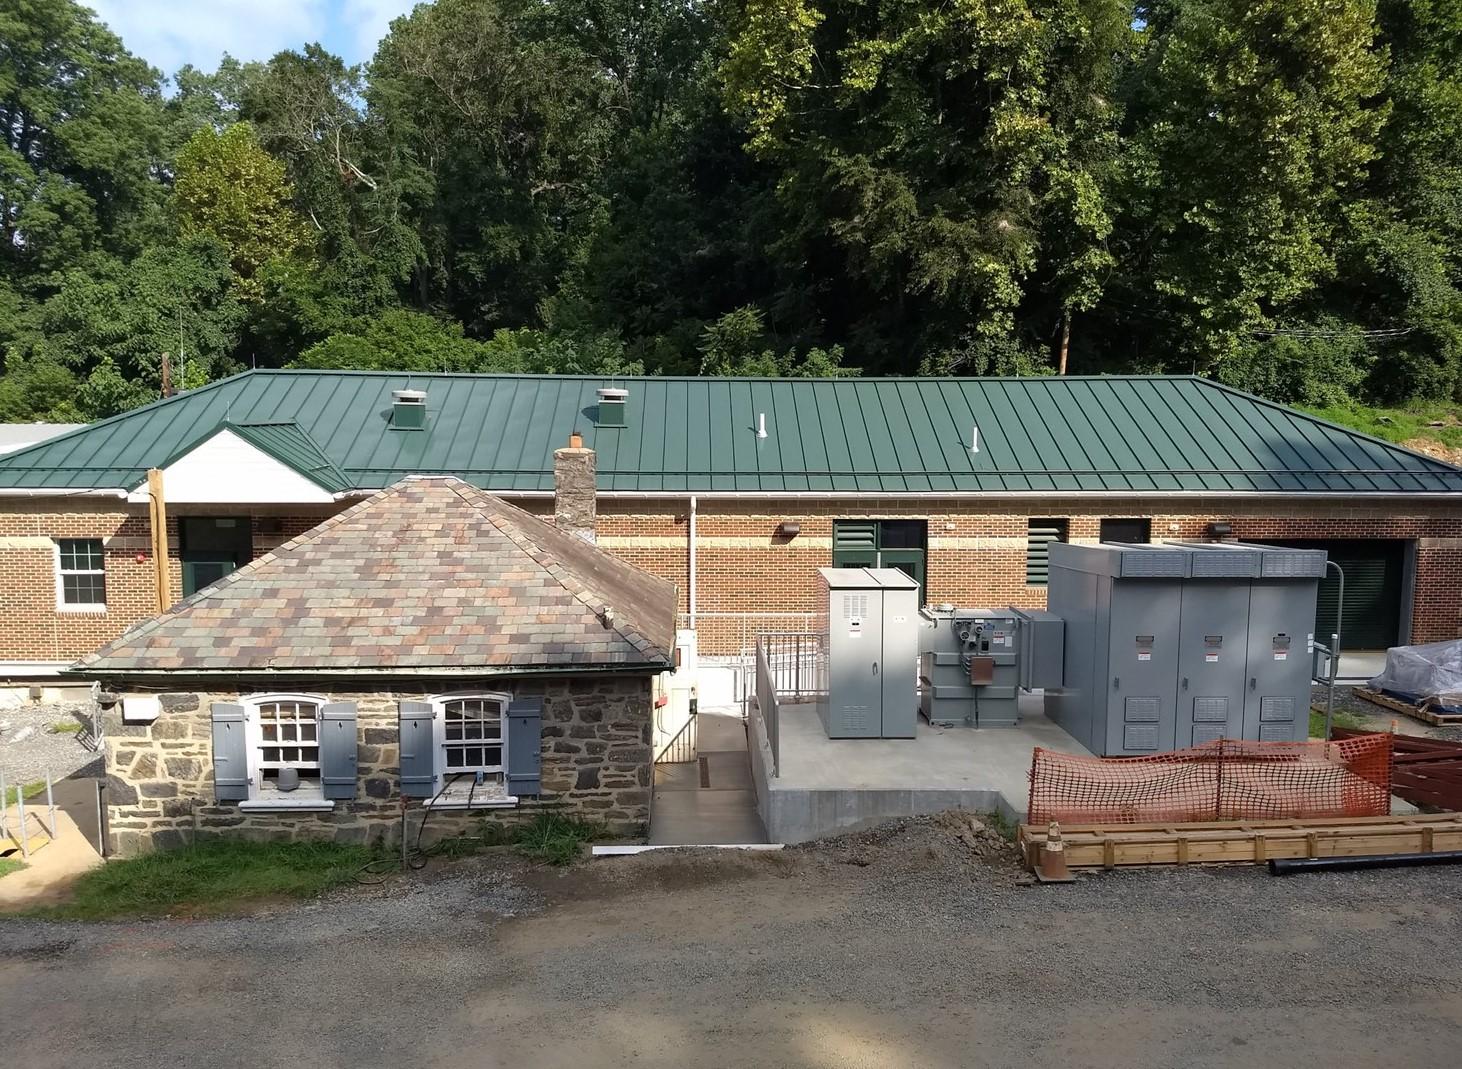 Aqua Pennsylvania Invests $31 Million in Upgrades to Wastewater Plant in Delco